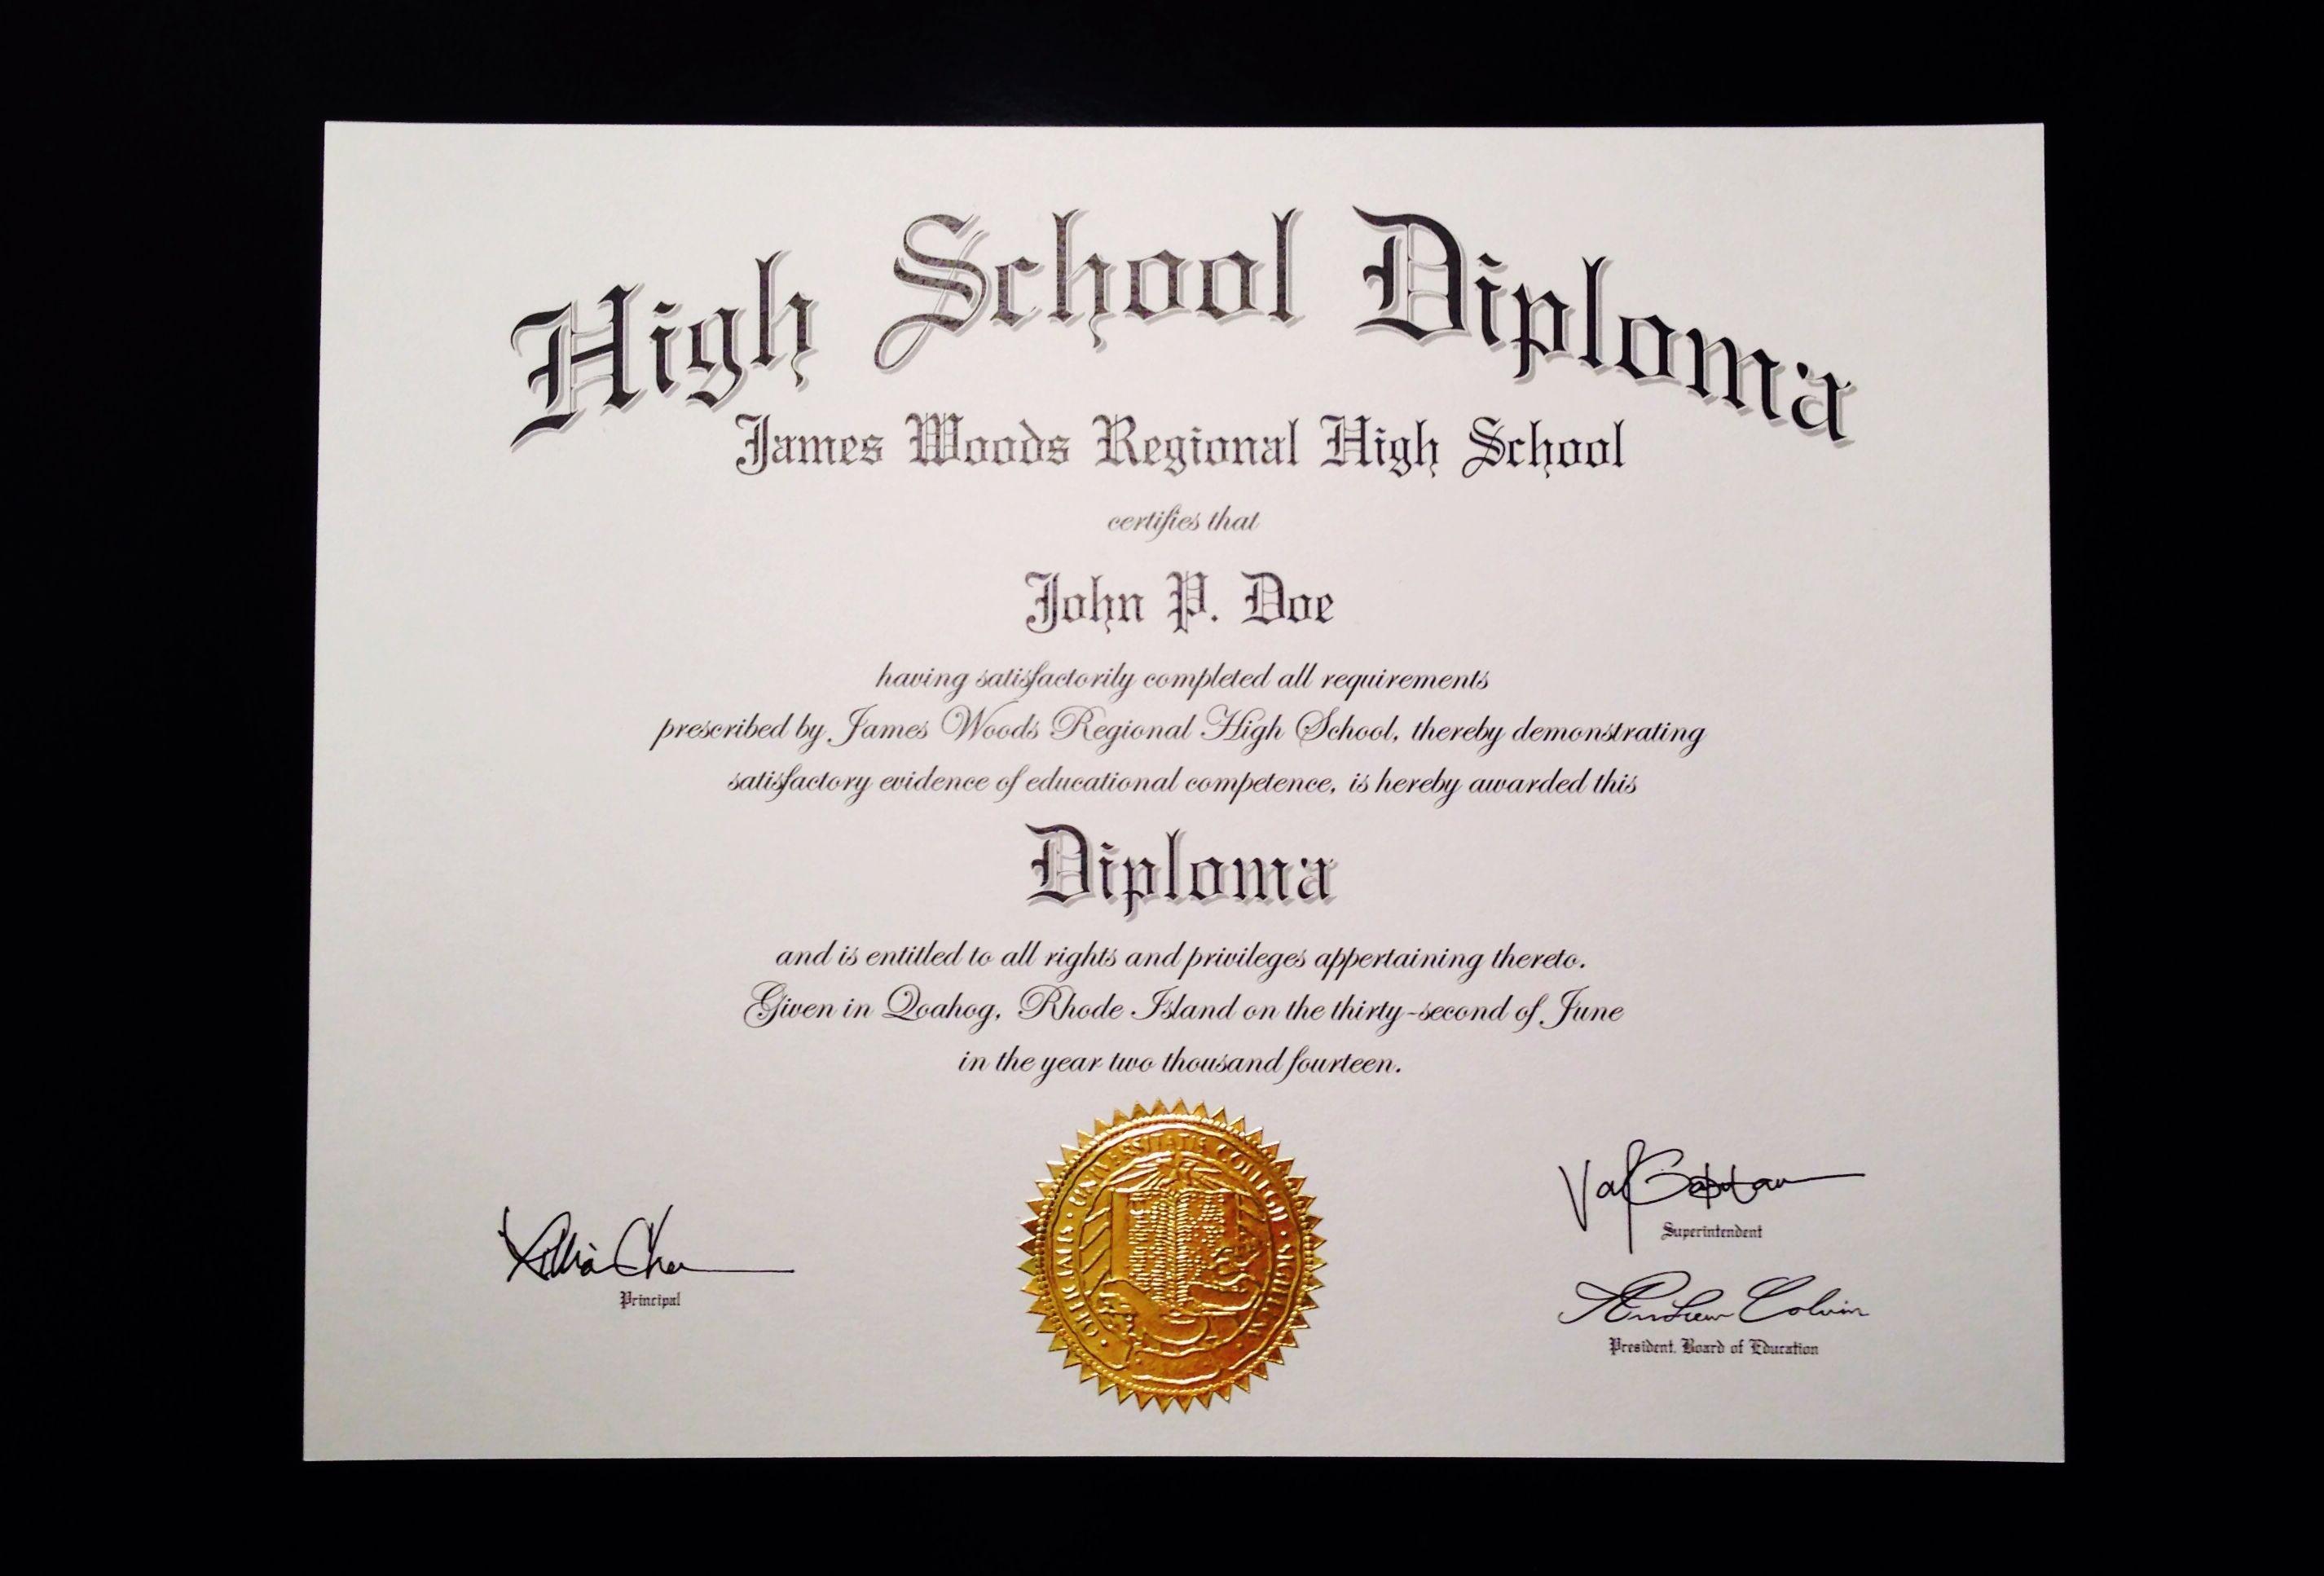 School Certificate Template Free Printable Certificates | Diploma - Free Printable Ged Certificate